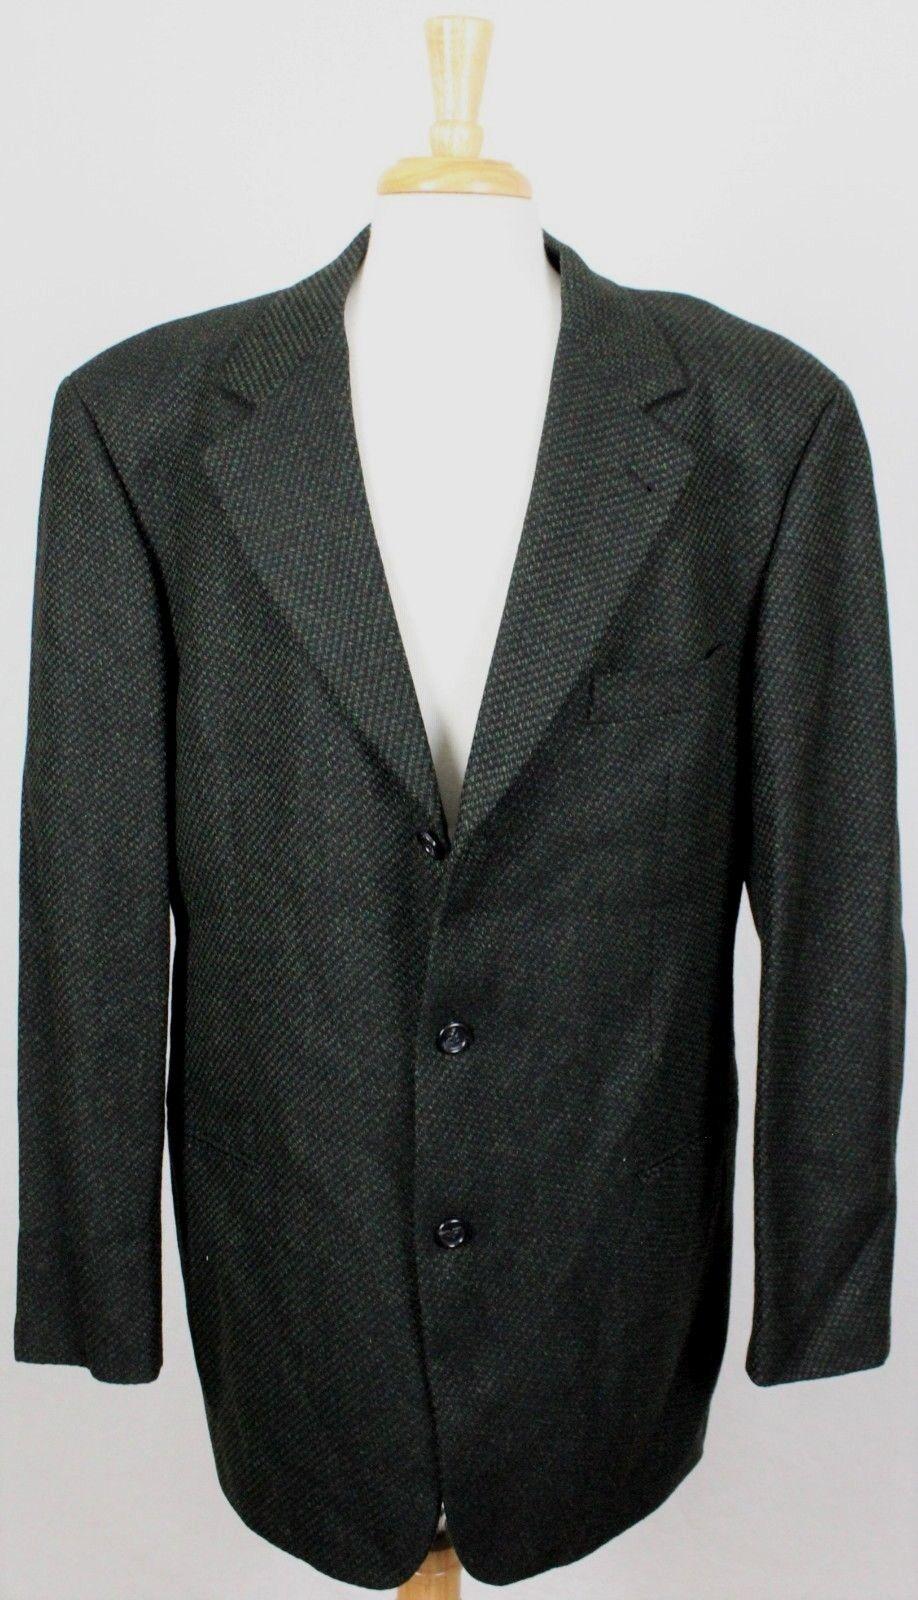 Hugo Boss Vintage USA Wool/Cashmere 3 Button Sport Coat Grün  Herren 44L